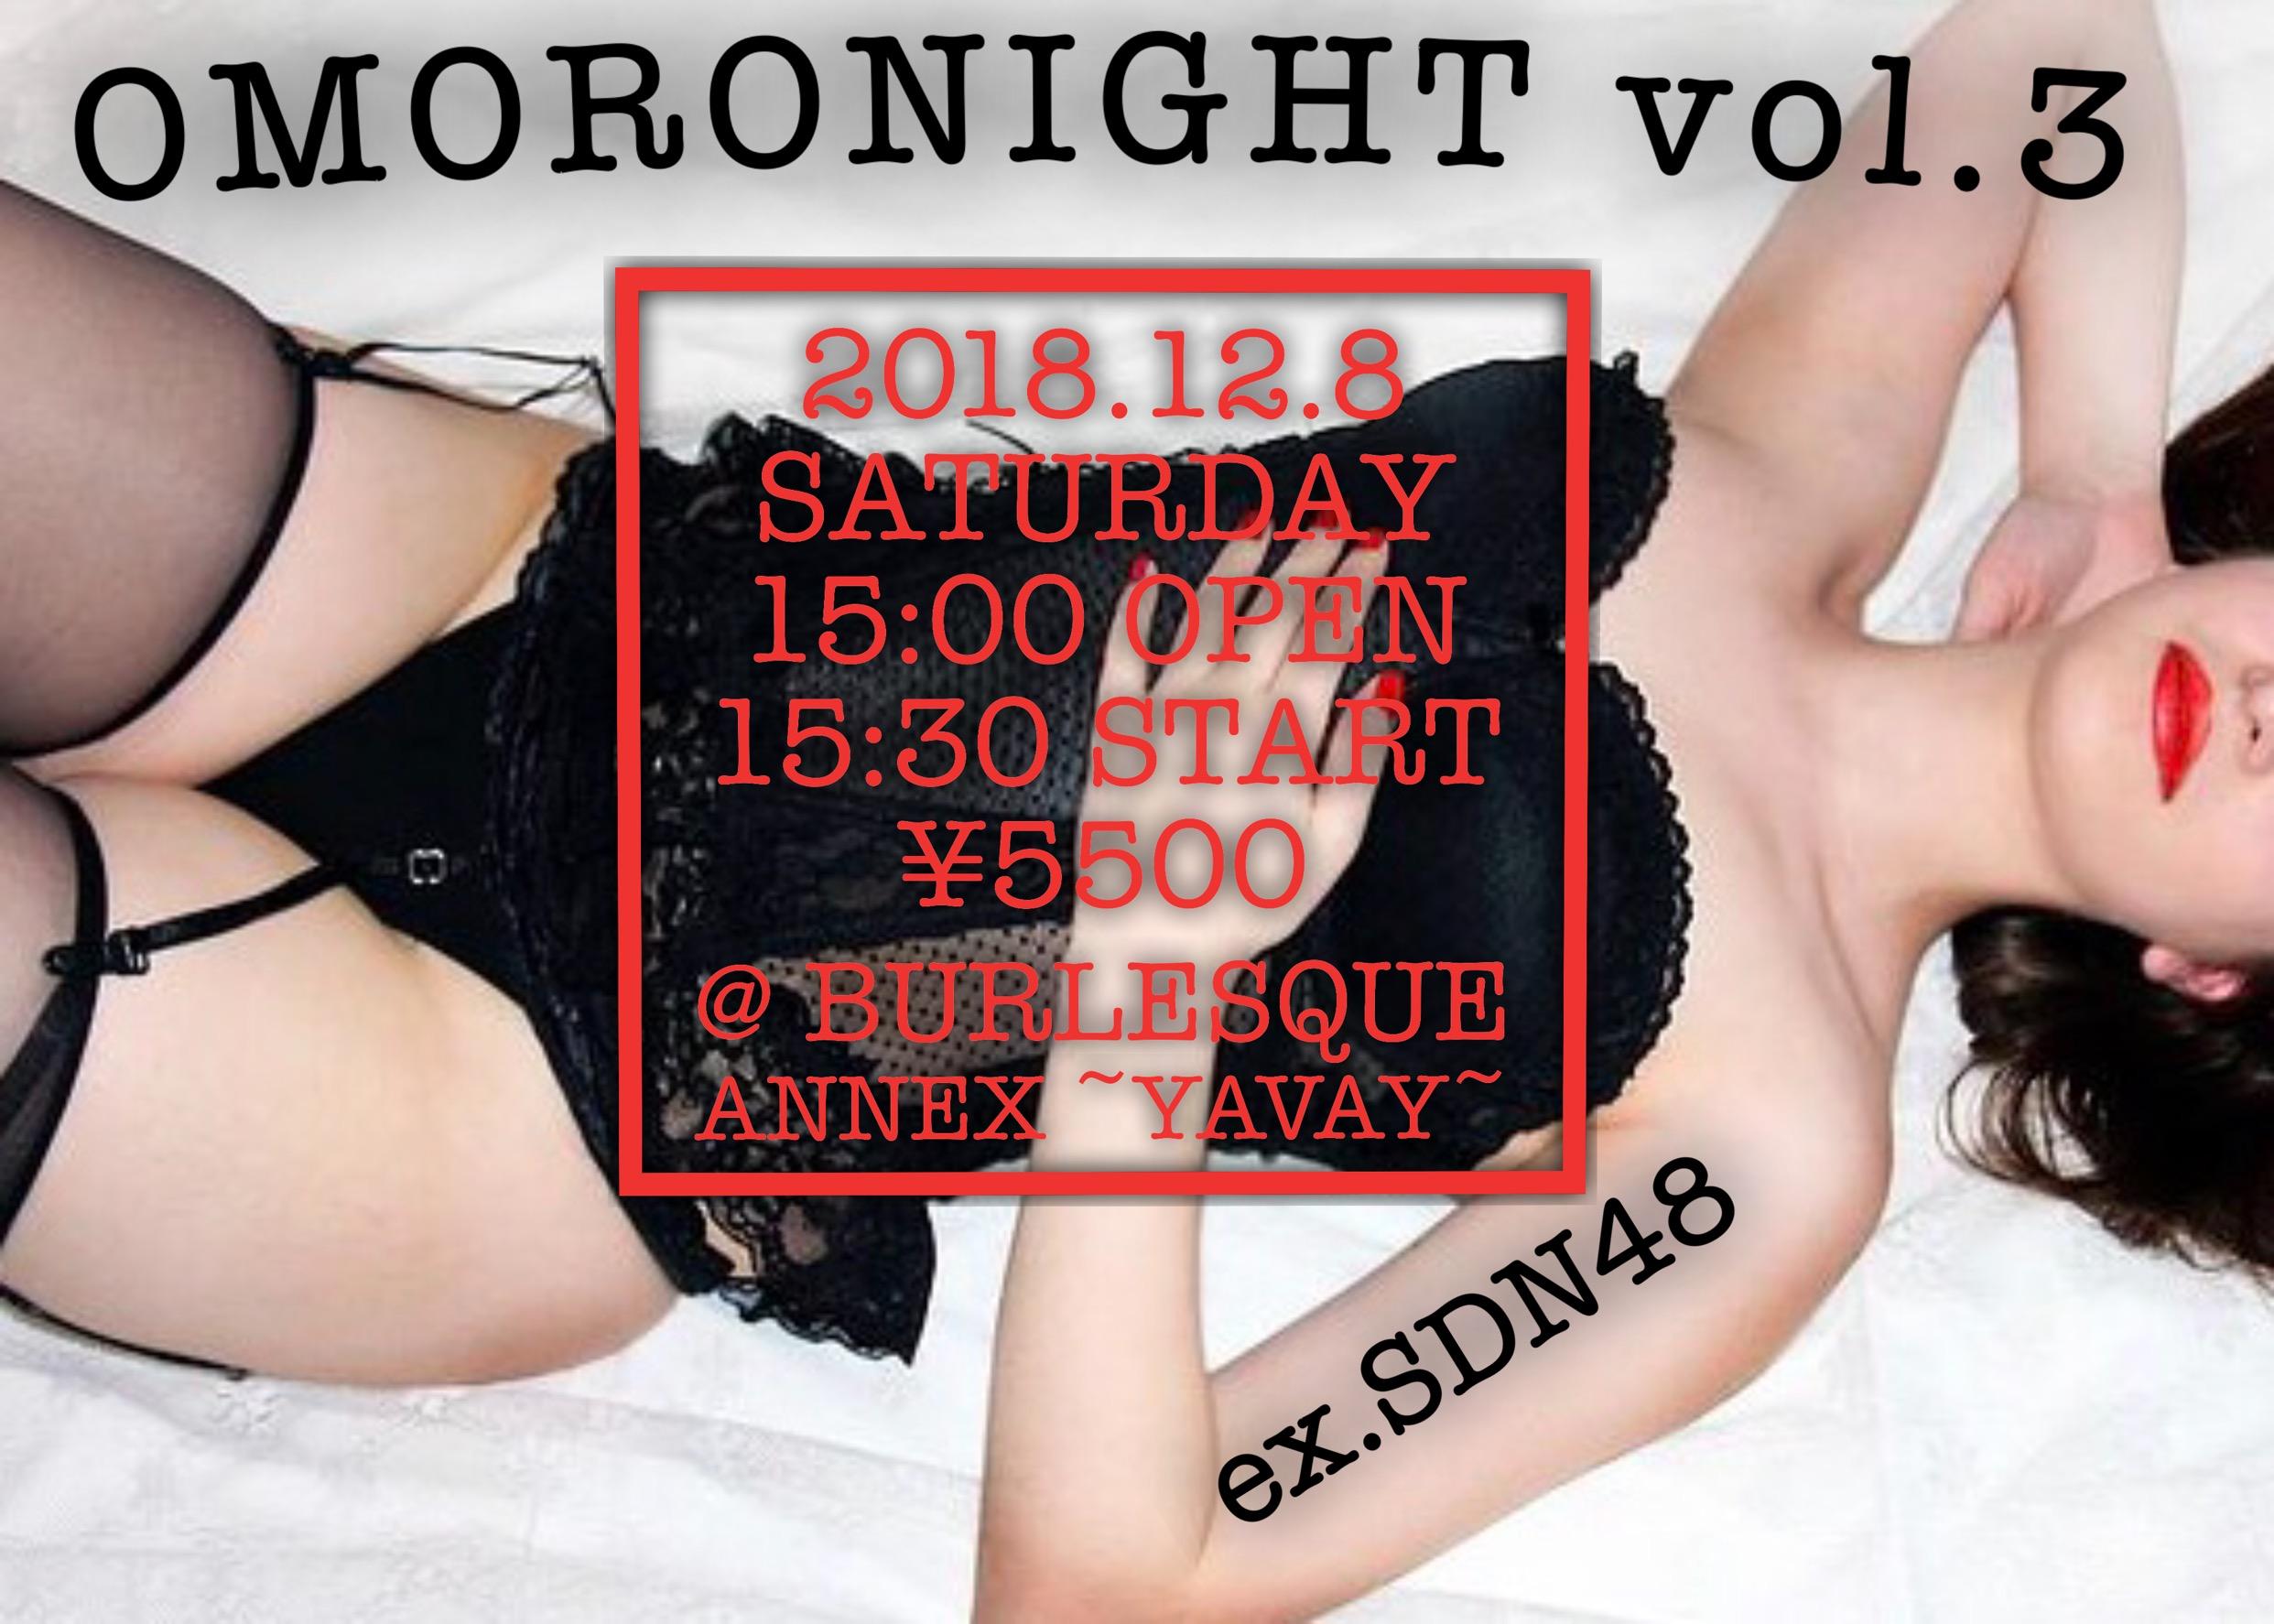 OMORO NIGHT!!〜Vol.3〜 伊東愛専用チケット購入ページ